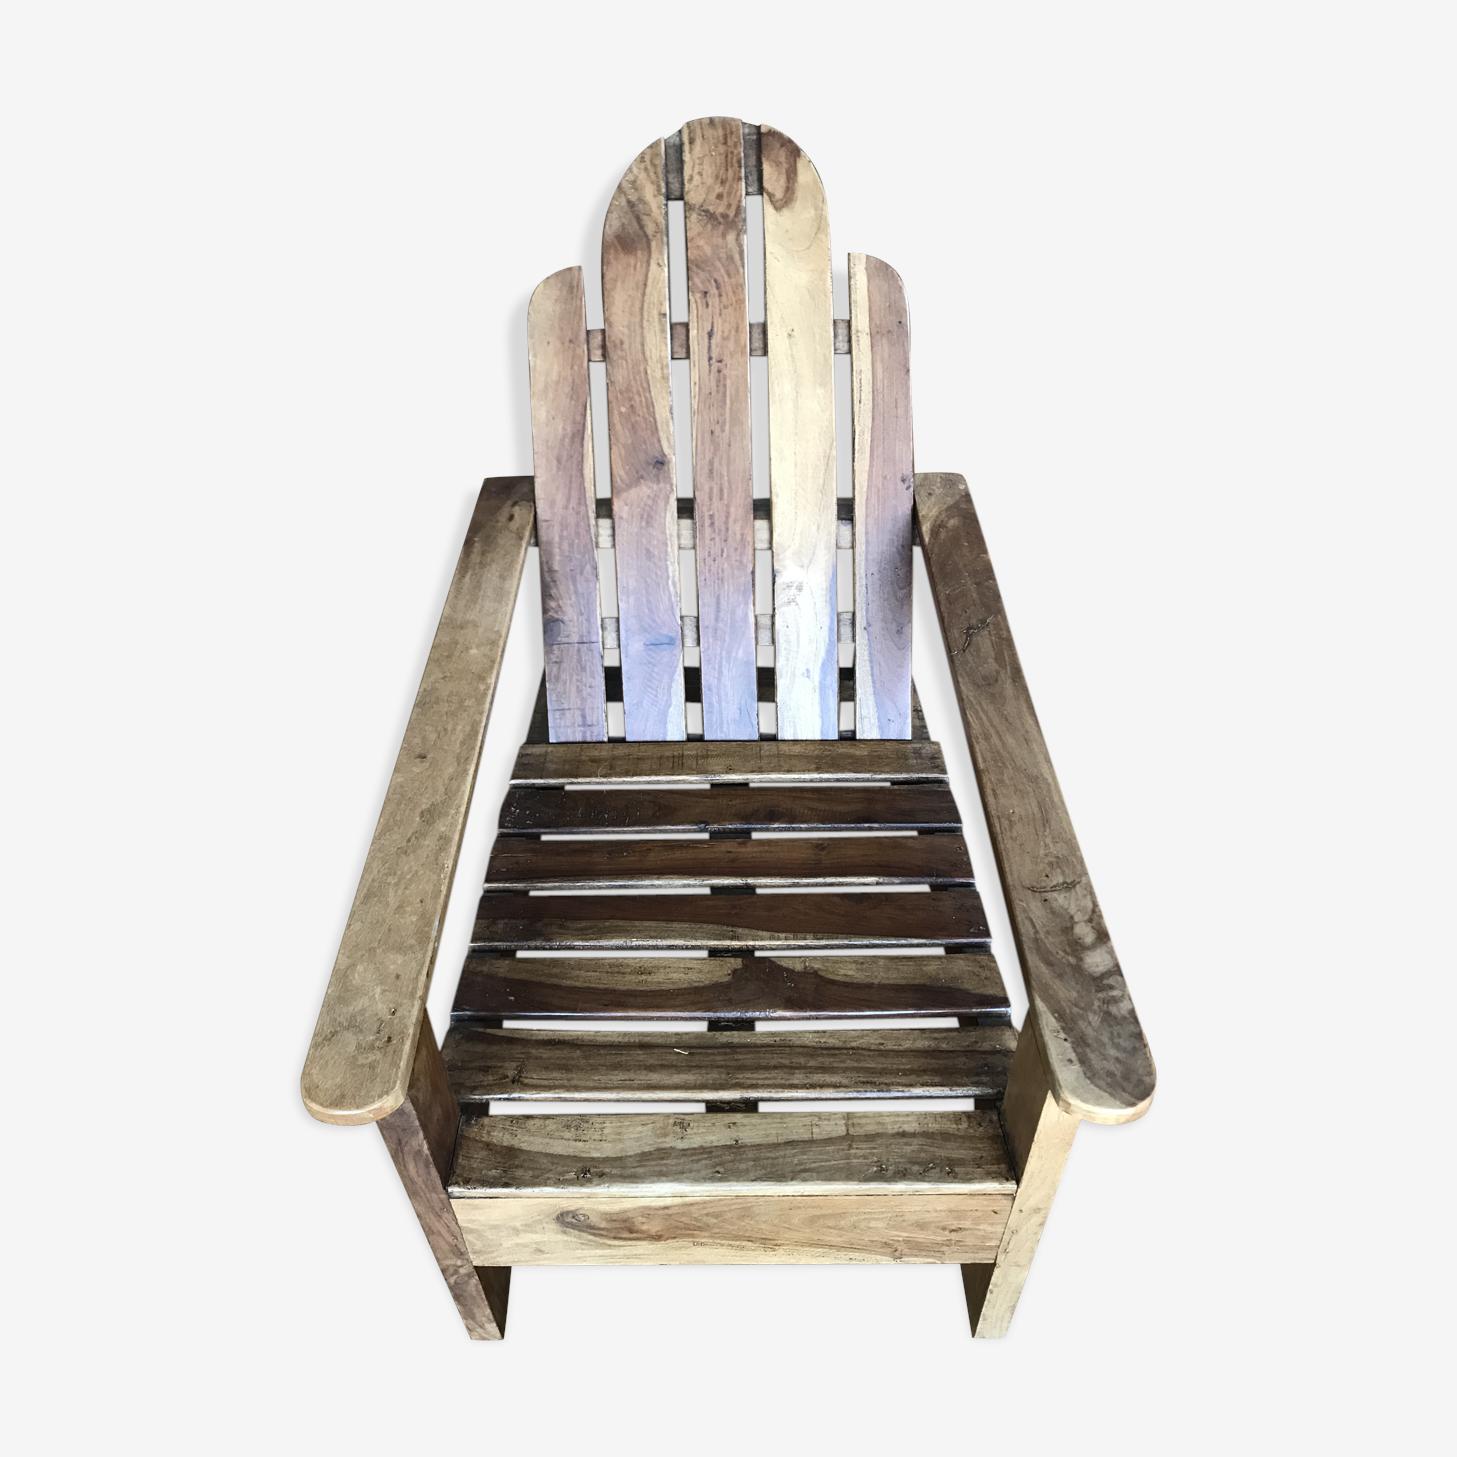 Chaise longue Sheesham